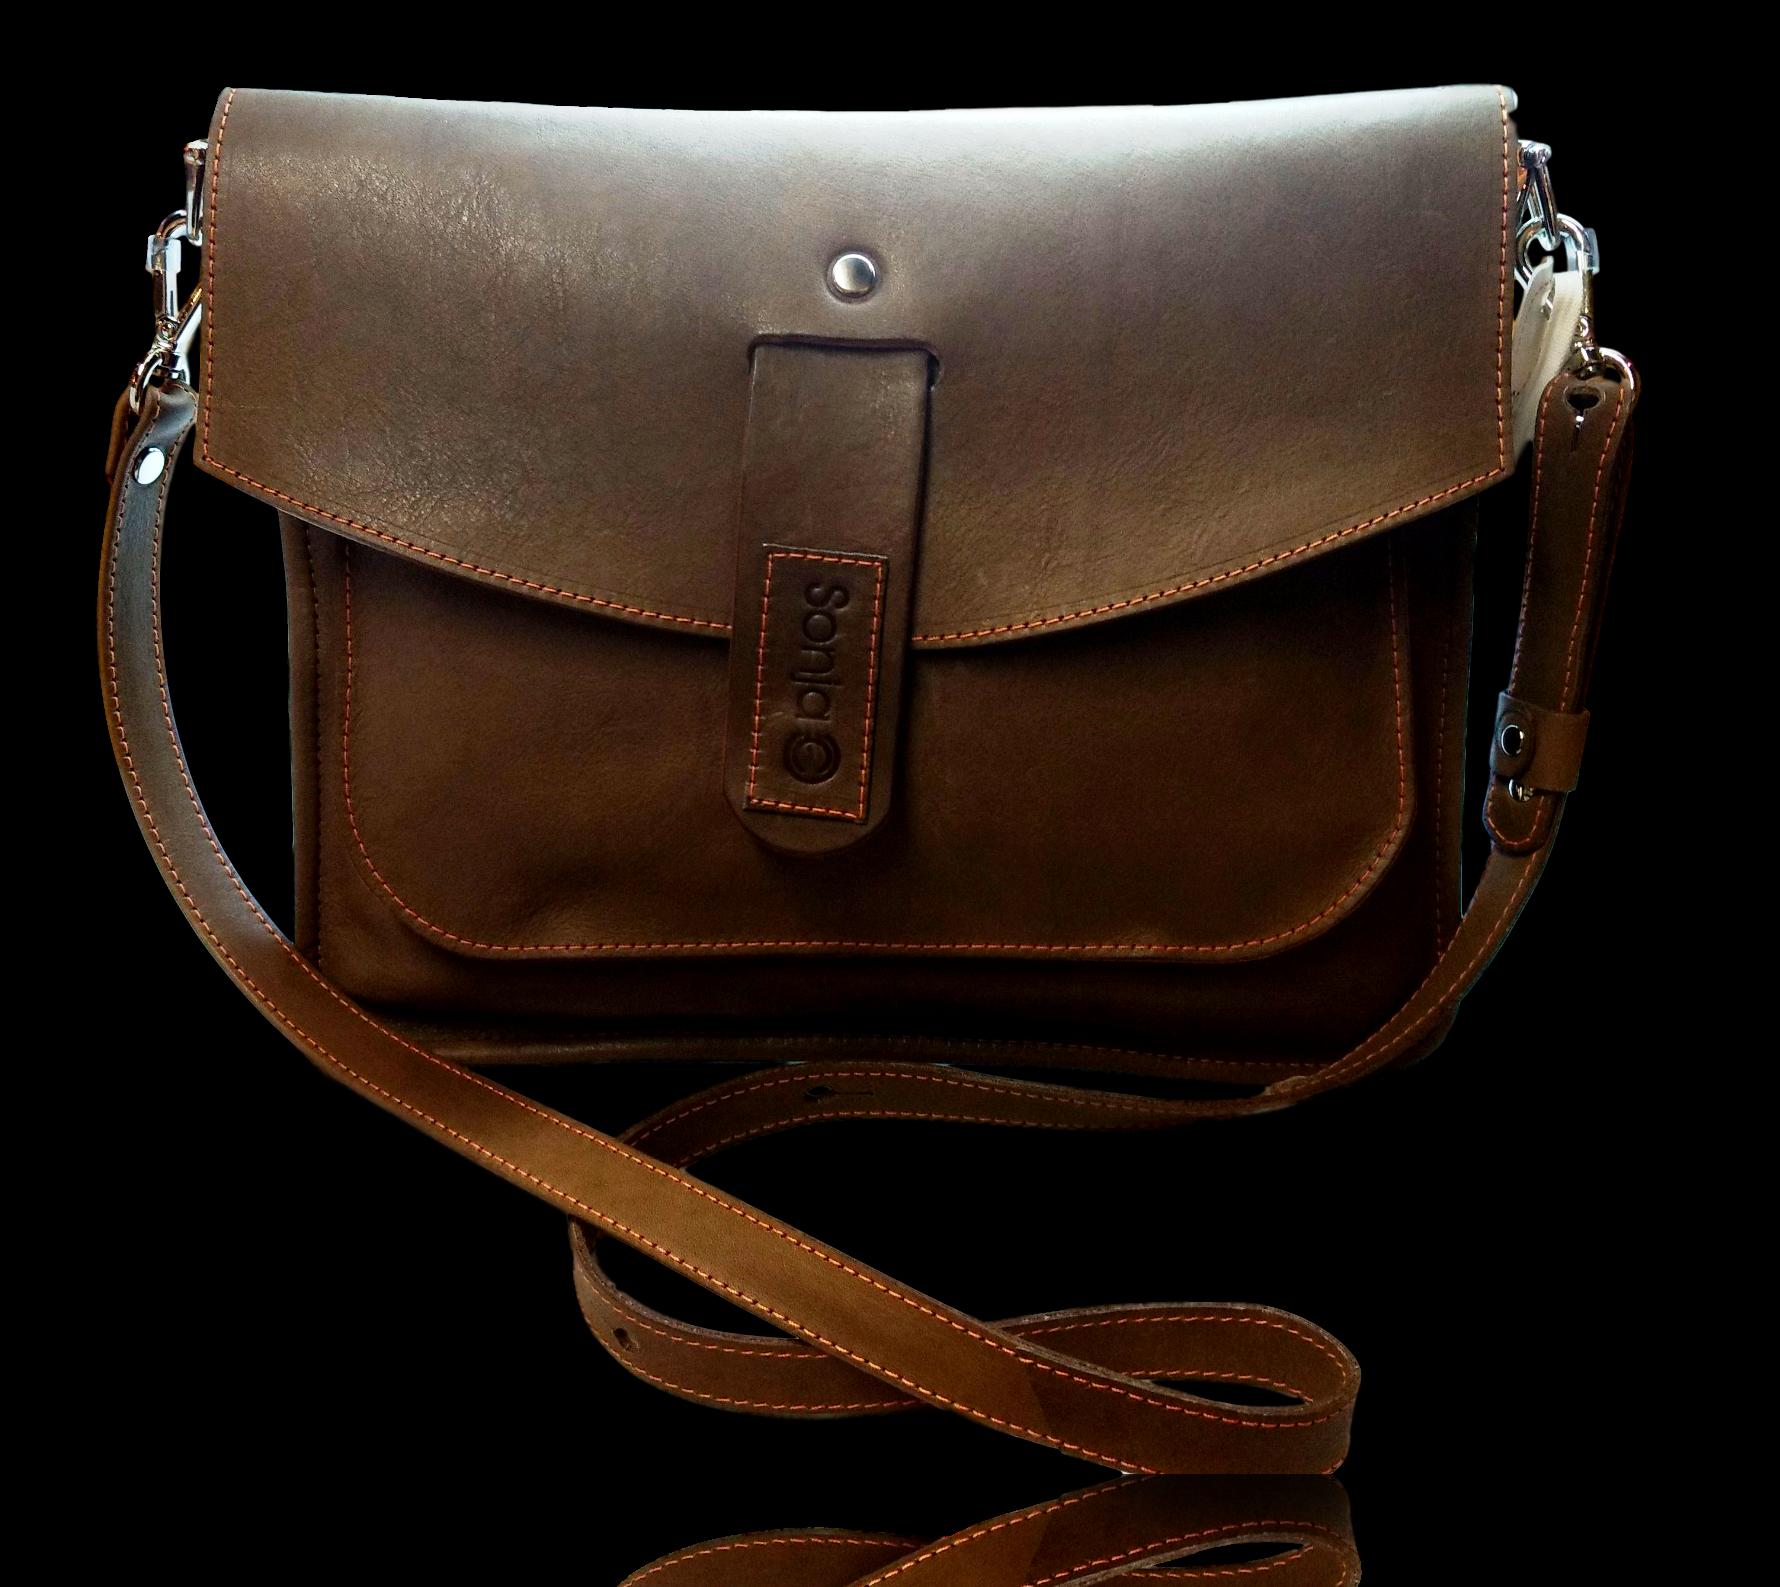 3 Pocket Leather Clutch